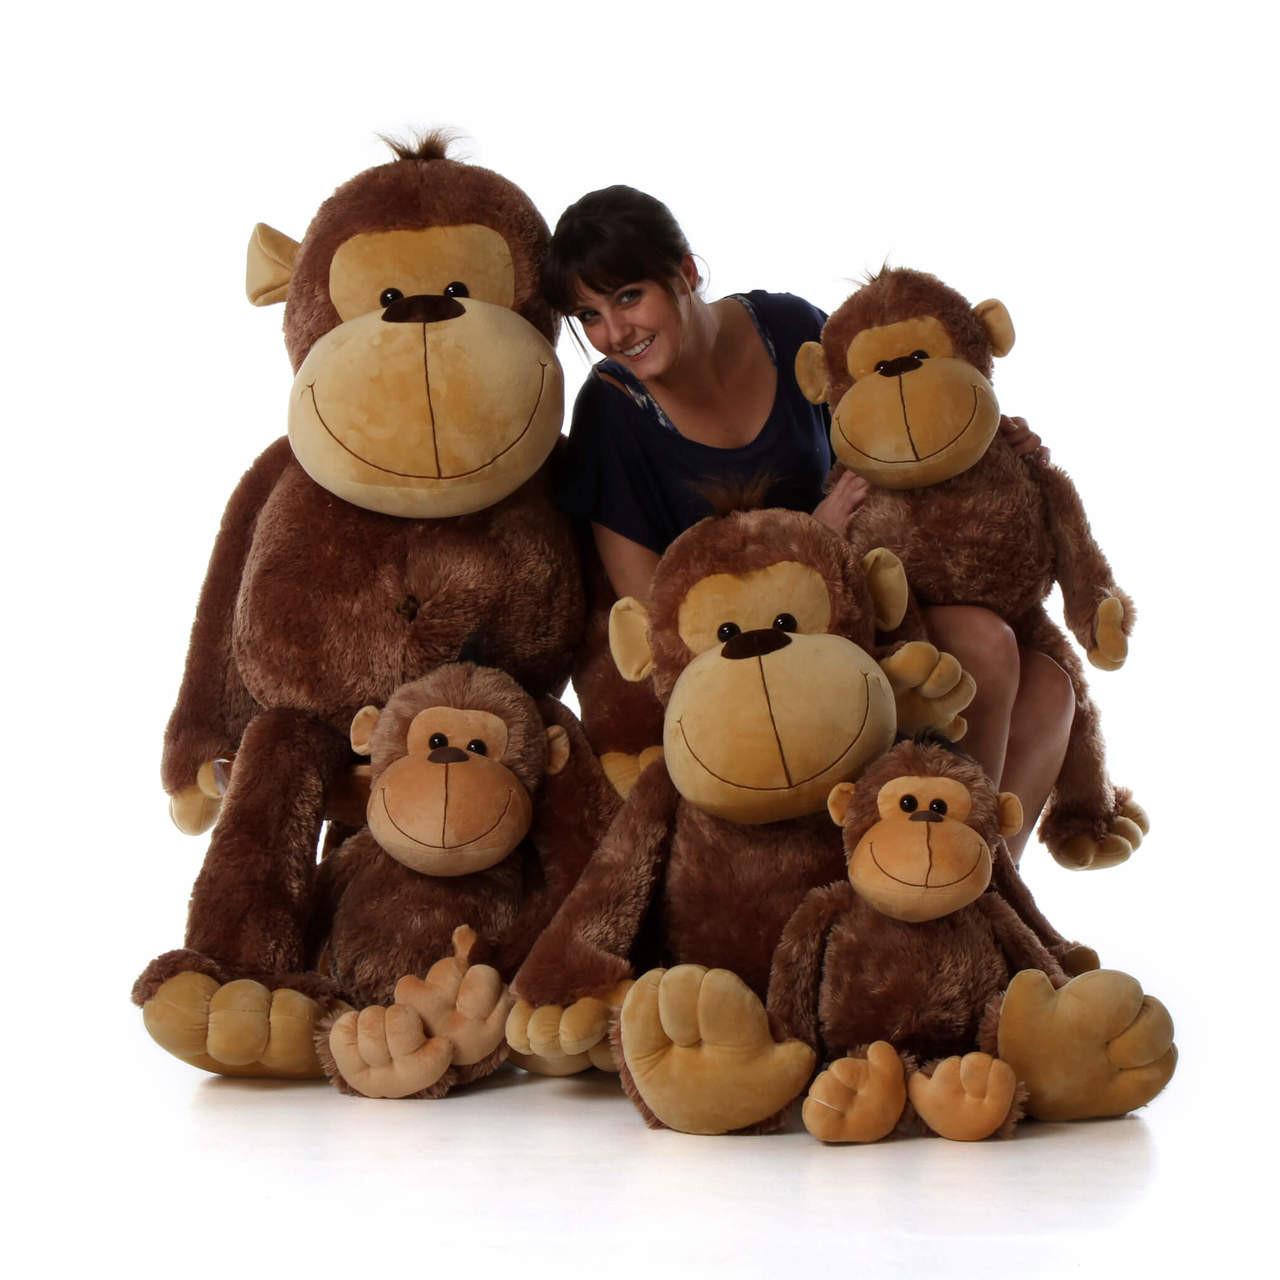 Big Stuffed Monkeys family from Giant Teddy brand